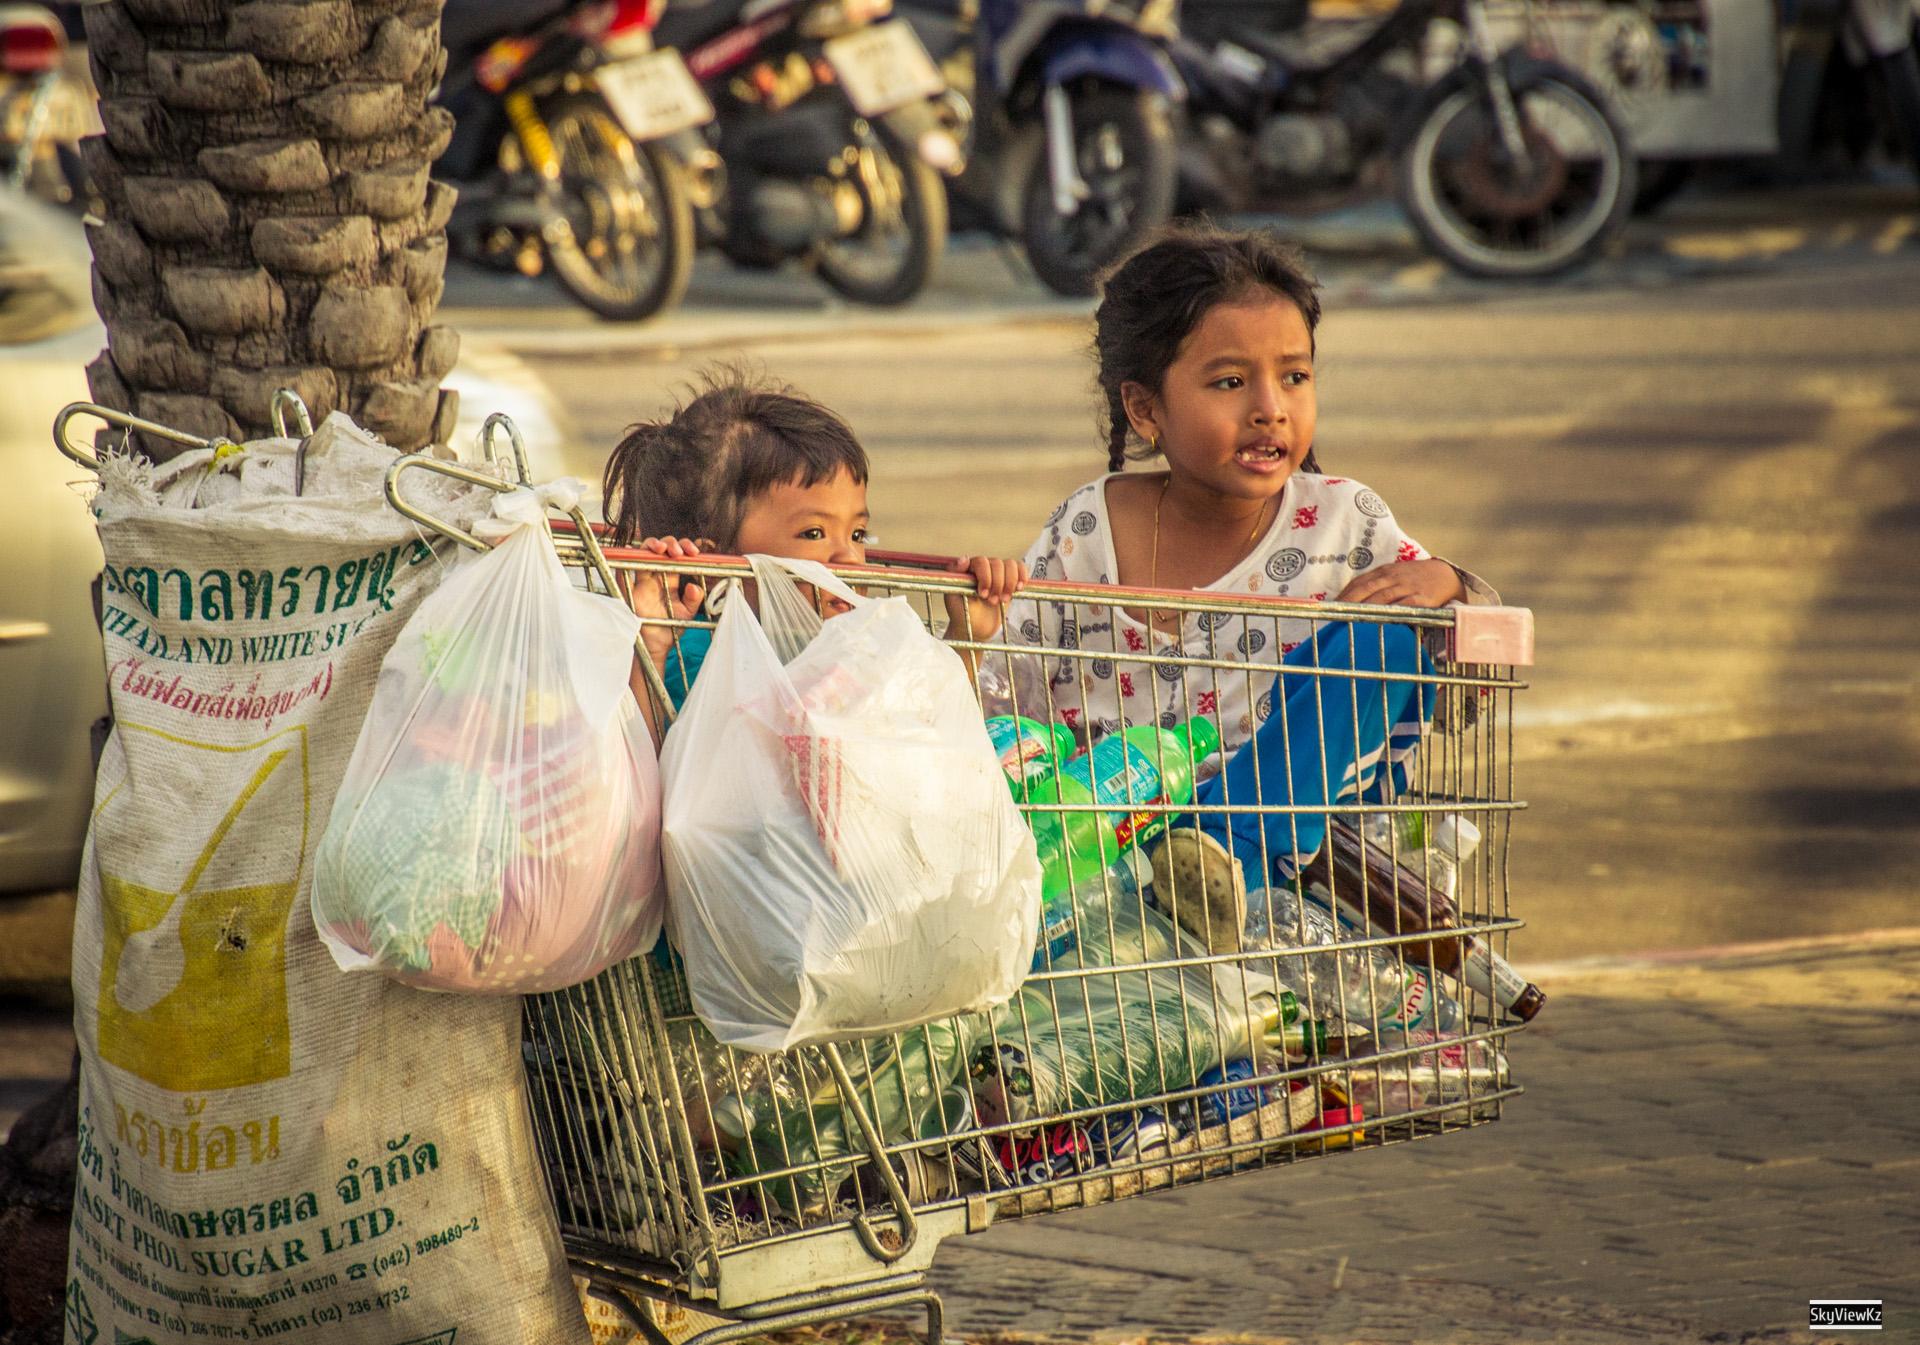 Pattaya 2017 в фотографиях. Pattaya 2017 photos